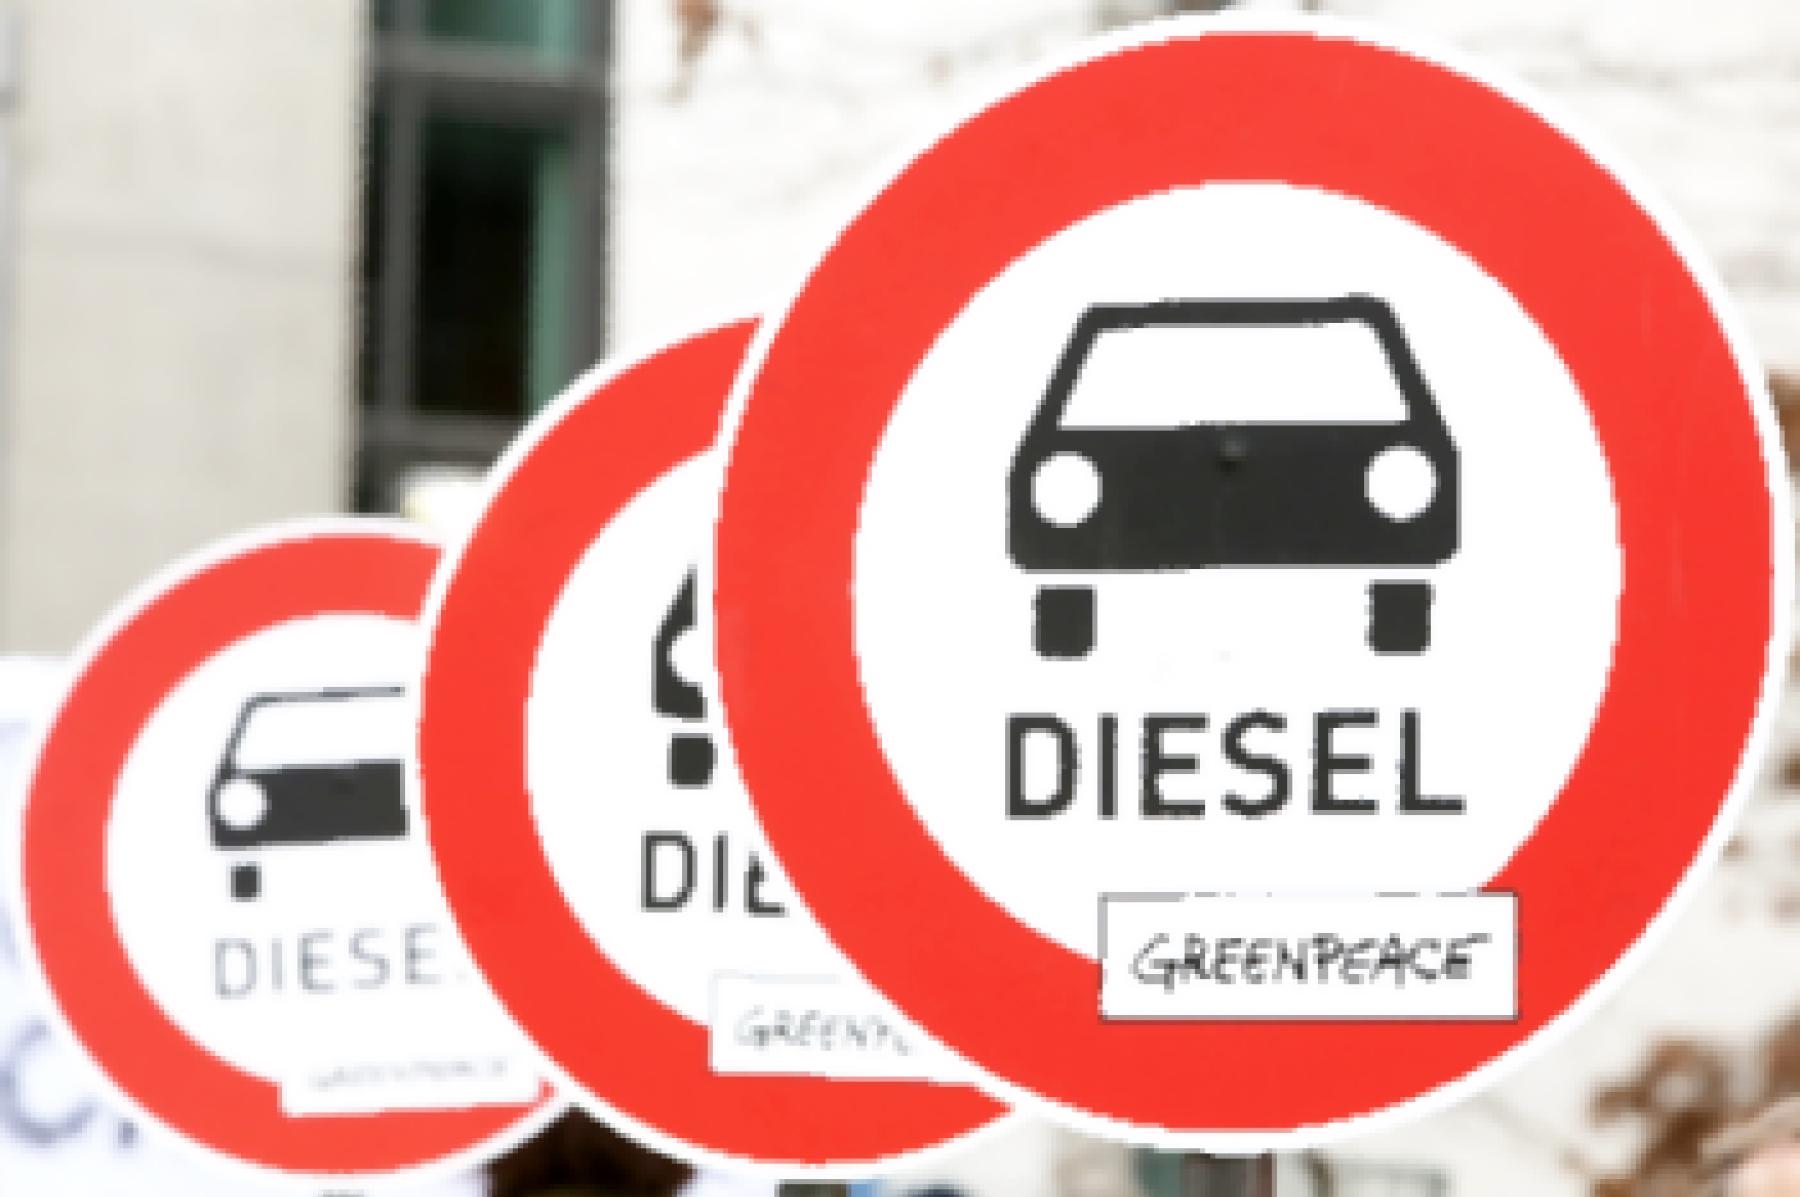 Photo of Η γερμανική αυτοκινητοβιομηχανία… τρέχει να μαζέψει τα ασυμμάζευτα [blog]